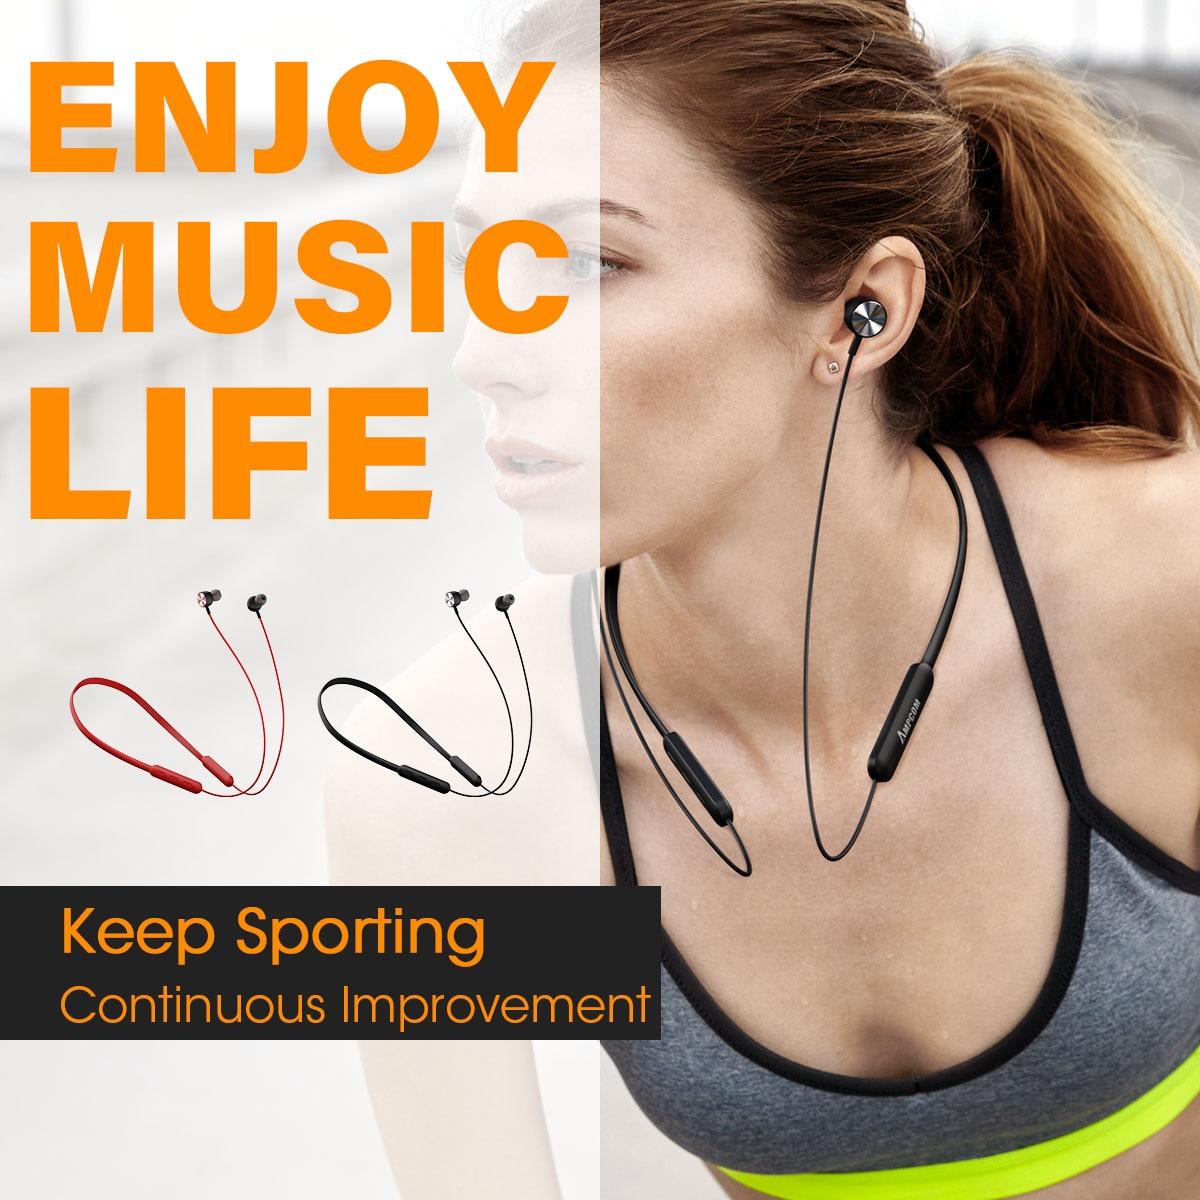 Купить с кэшбэком AMPCOM Bluetooth Earphone Sport Wireless Headphones IPX4 Waterproof  Earbuds Headset 8Hrs Music Time for iPhone xiaomi Huawei